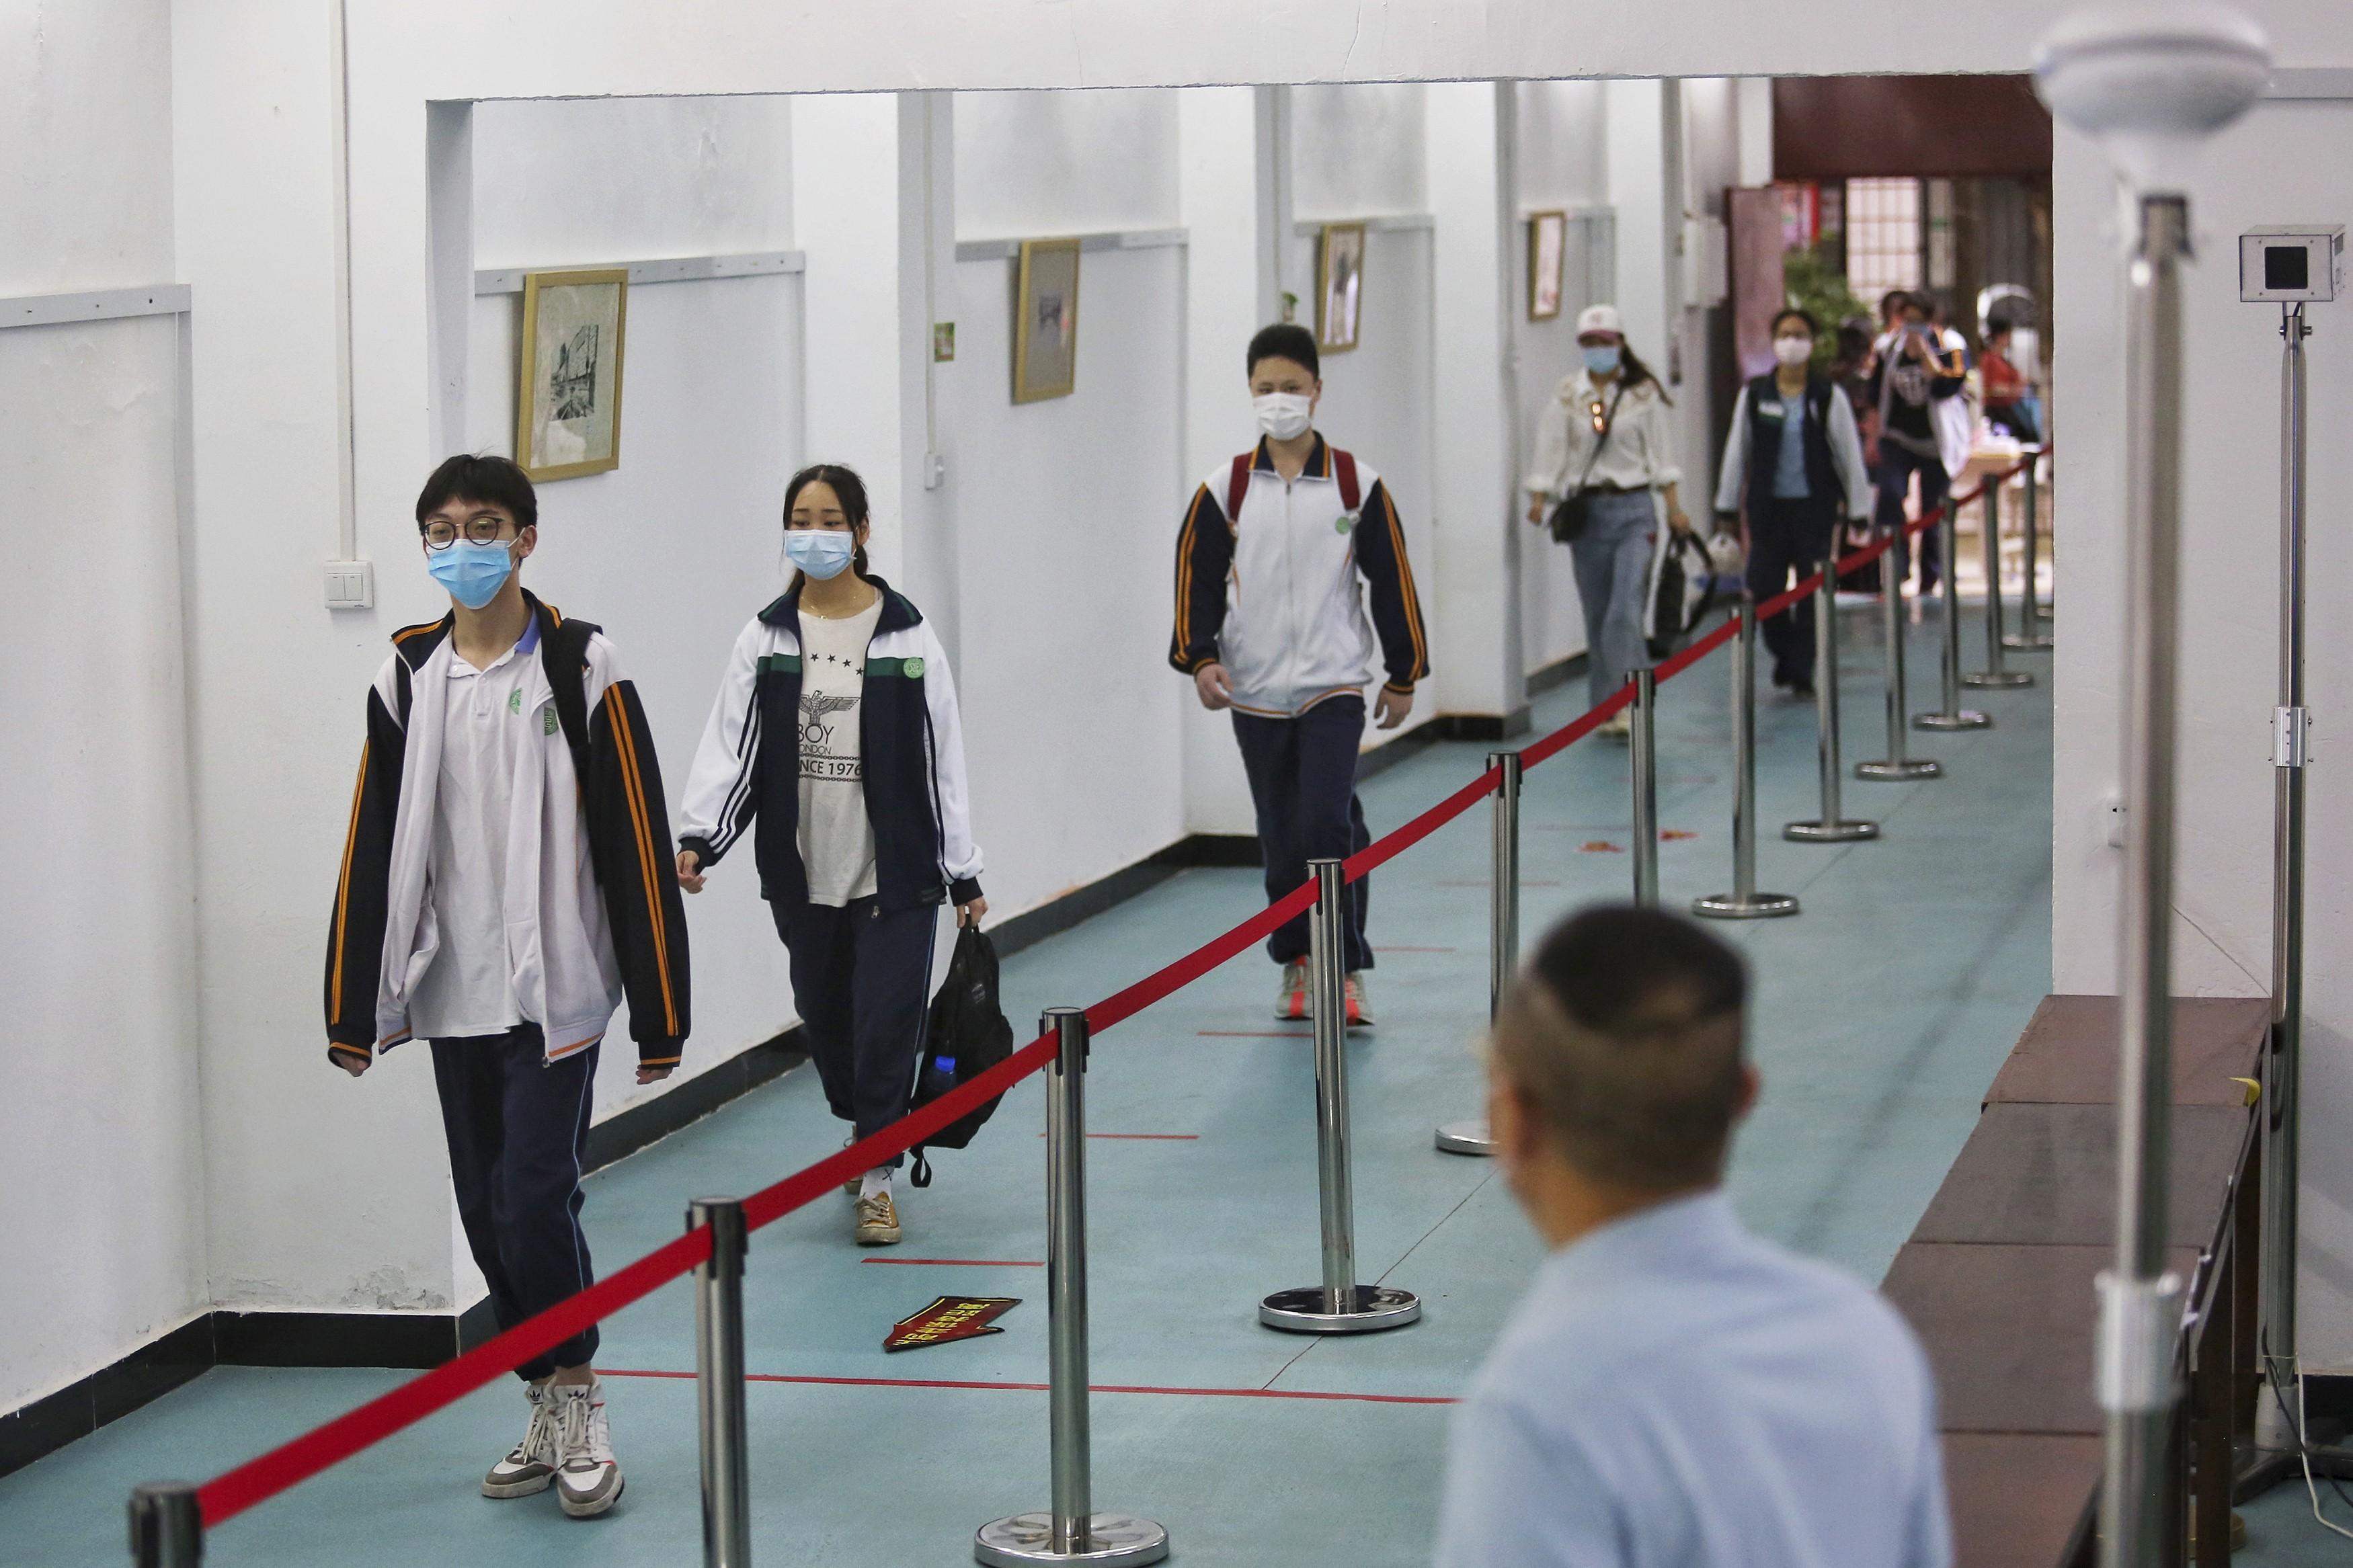 Estudos recentes mostram que distanciamento e máscaras diminuem o contágio pelo novo coronavírus